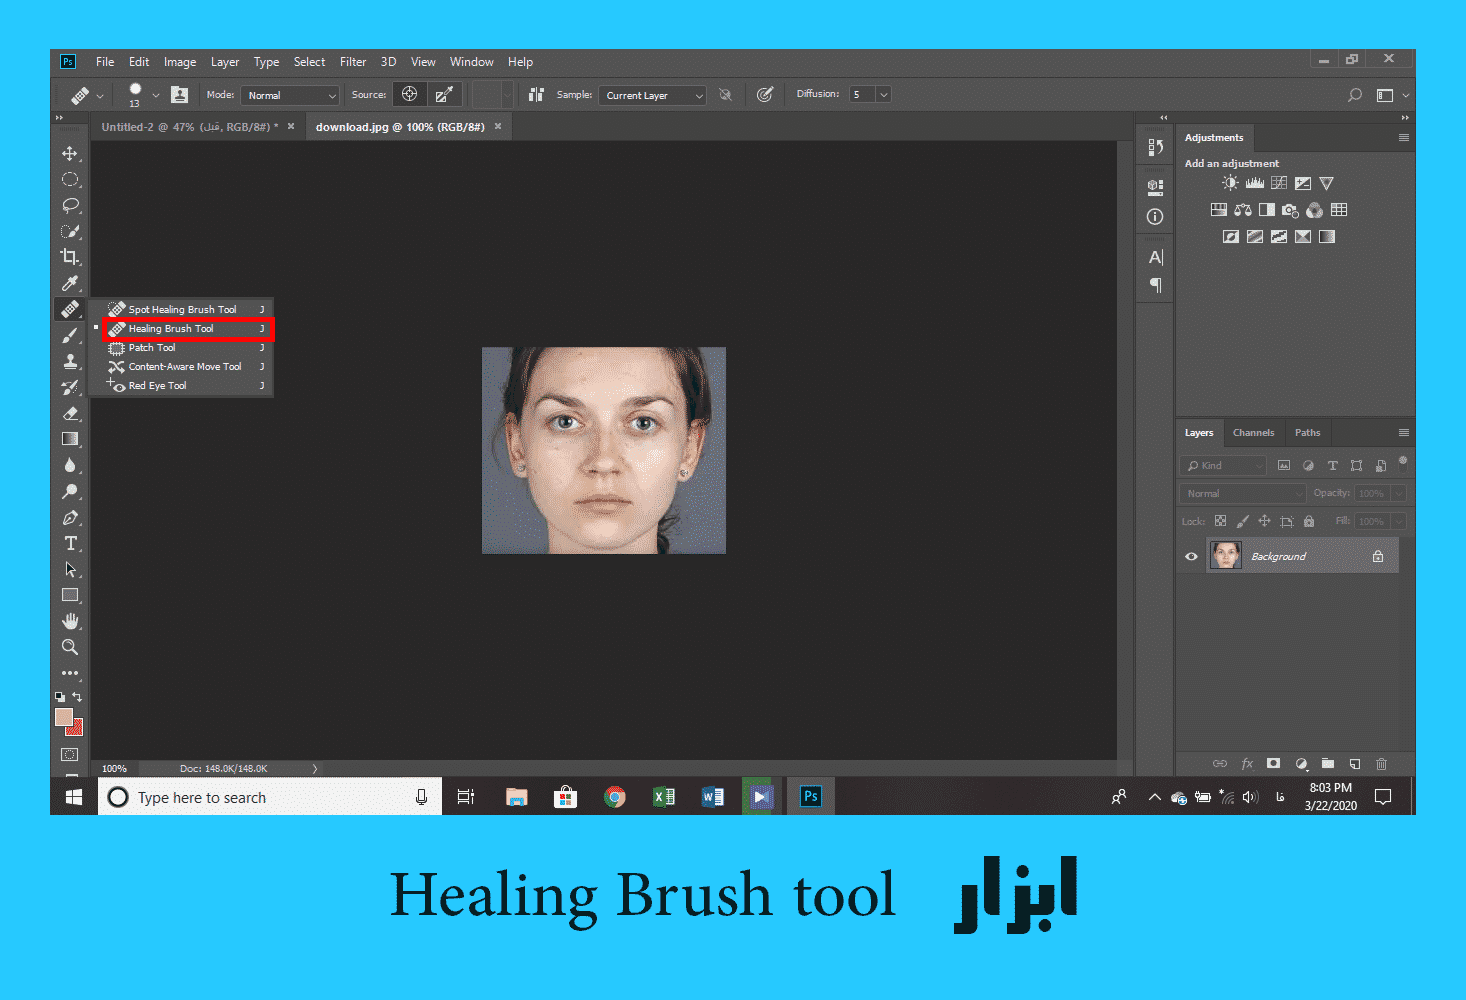 ابزار Healing Brush tool